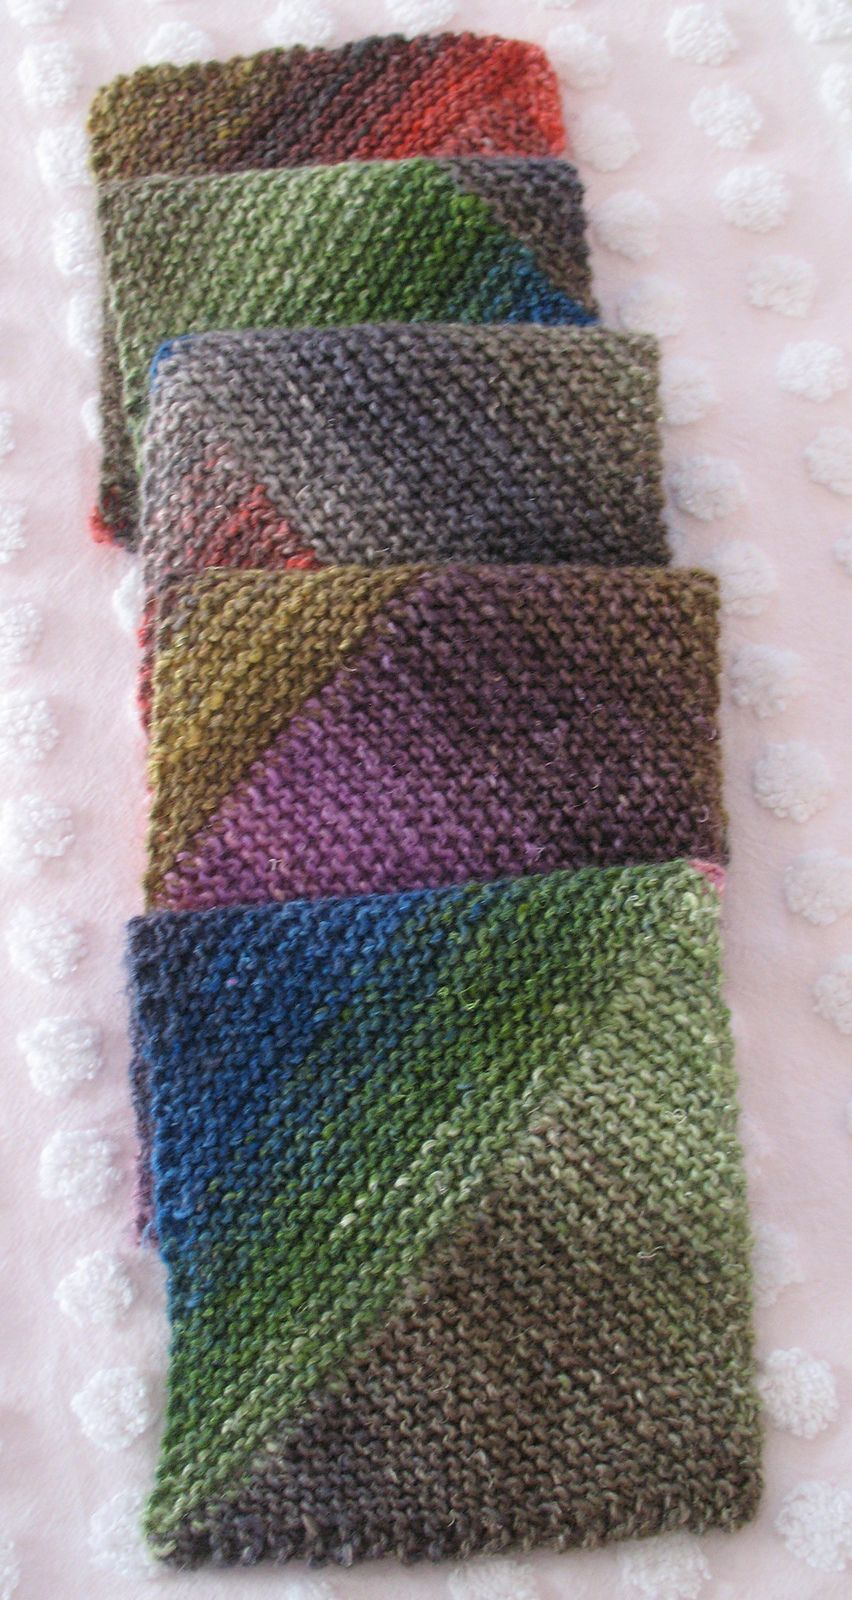 Multi-Diagonal knit | Going Stitch Crazy | Pinterest | Pattern ...